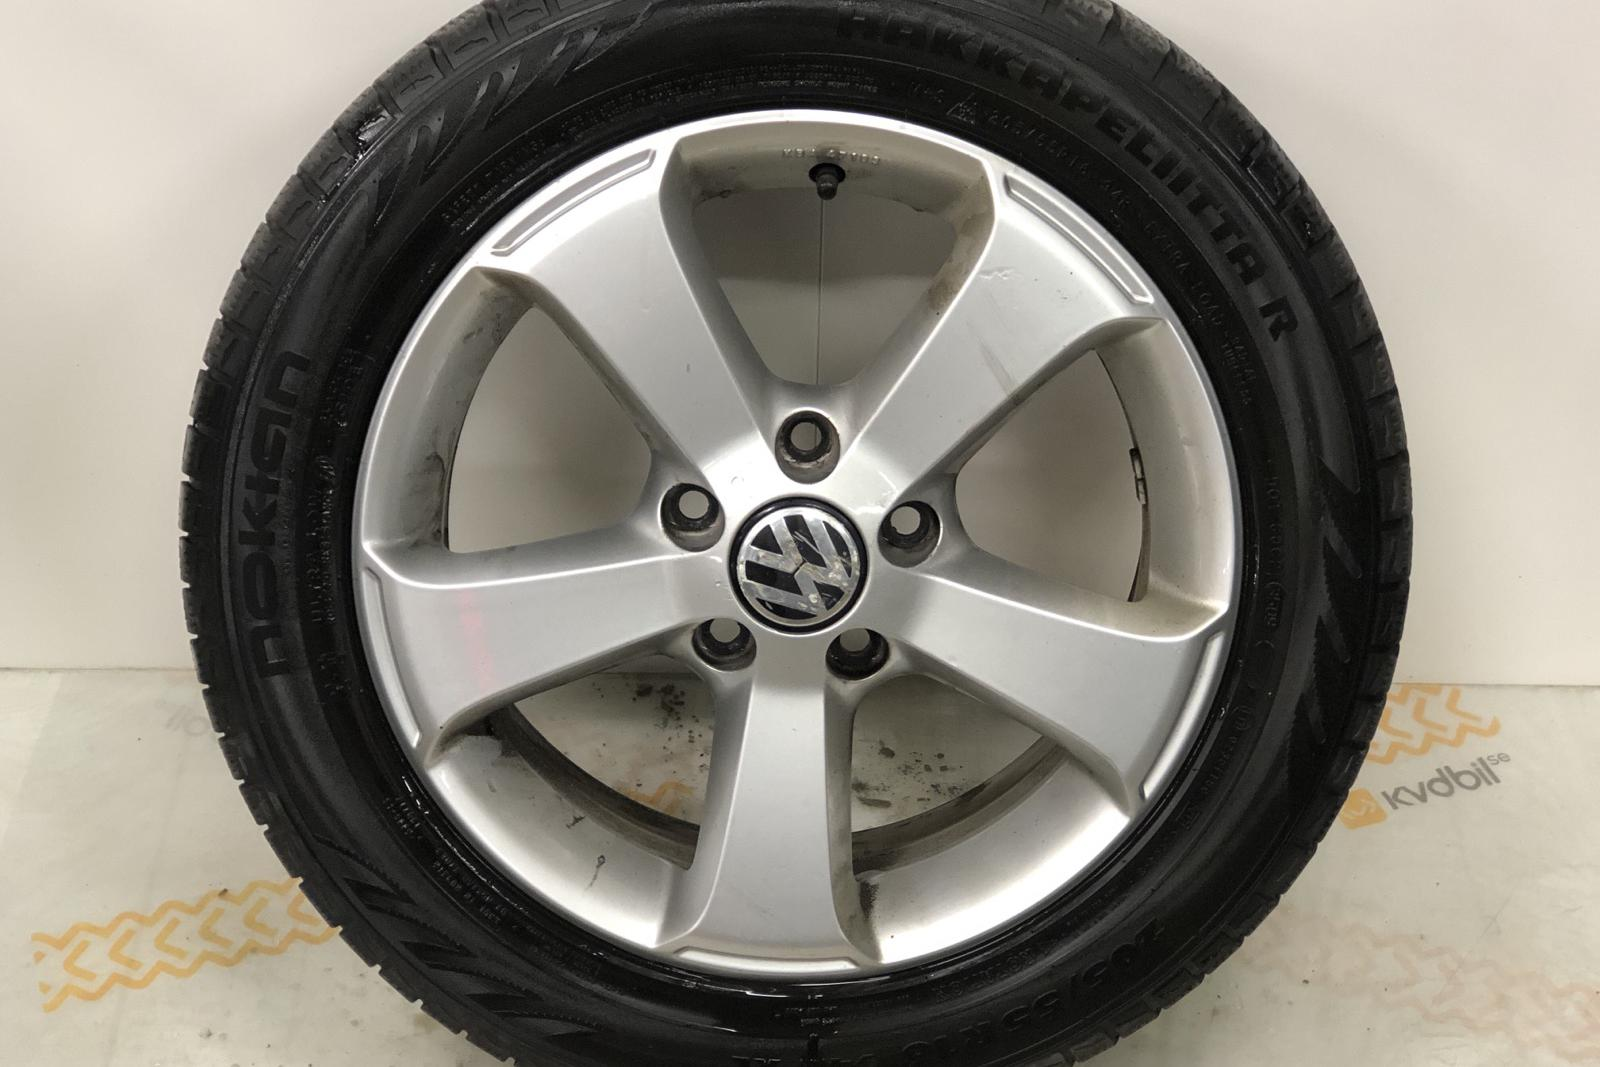 VW Passat 2.0 TDI BlueMotion Technology Variant 4Motion (177hk) - 154 000 km - Automatic - Light Brown - 2014